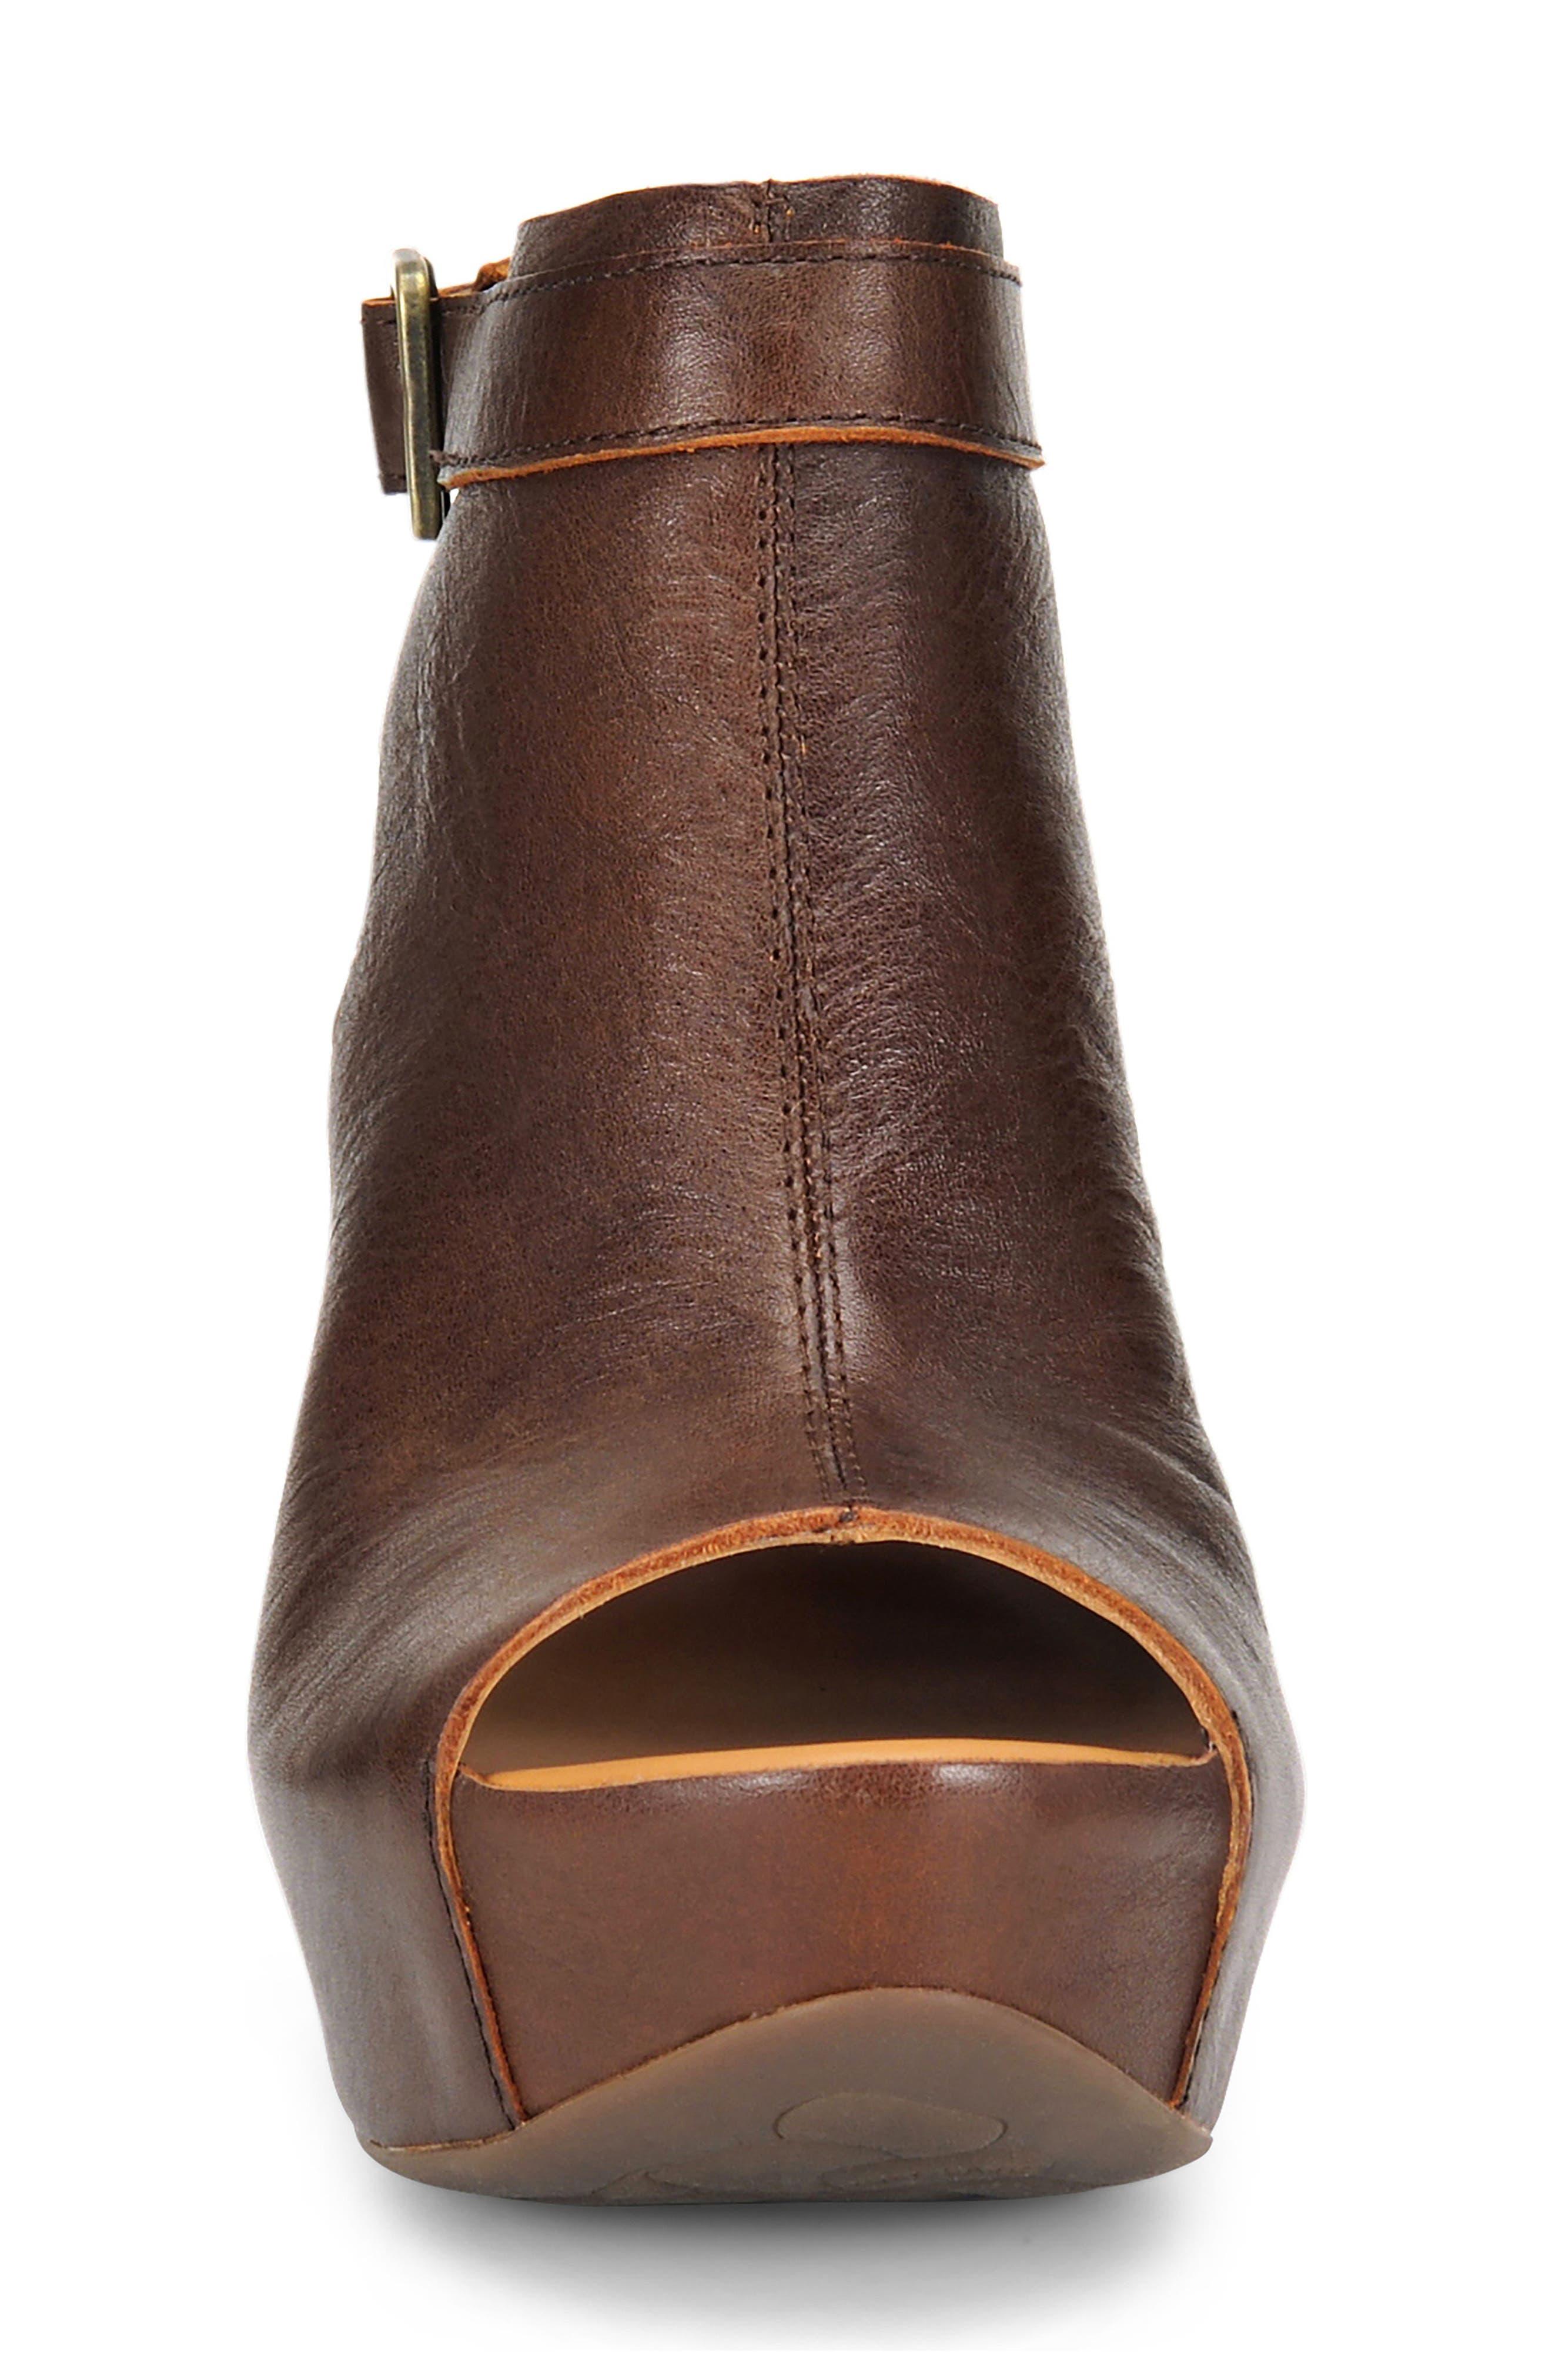 'Berit' Wedge Sandal,                             Alternate thumbnail 70, color,